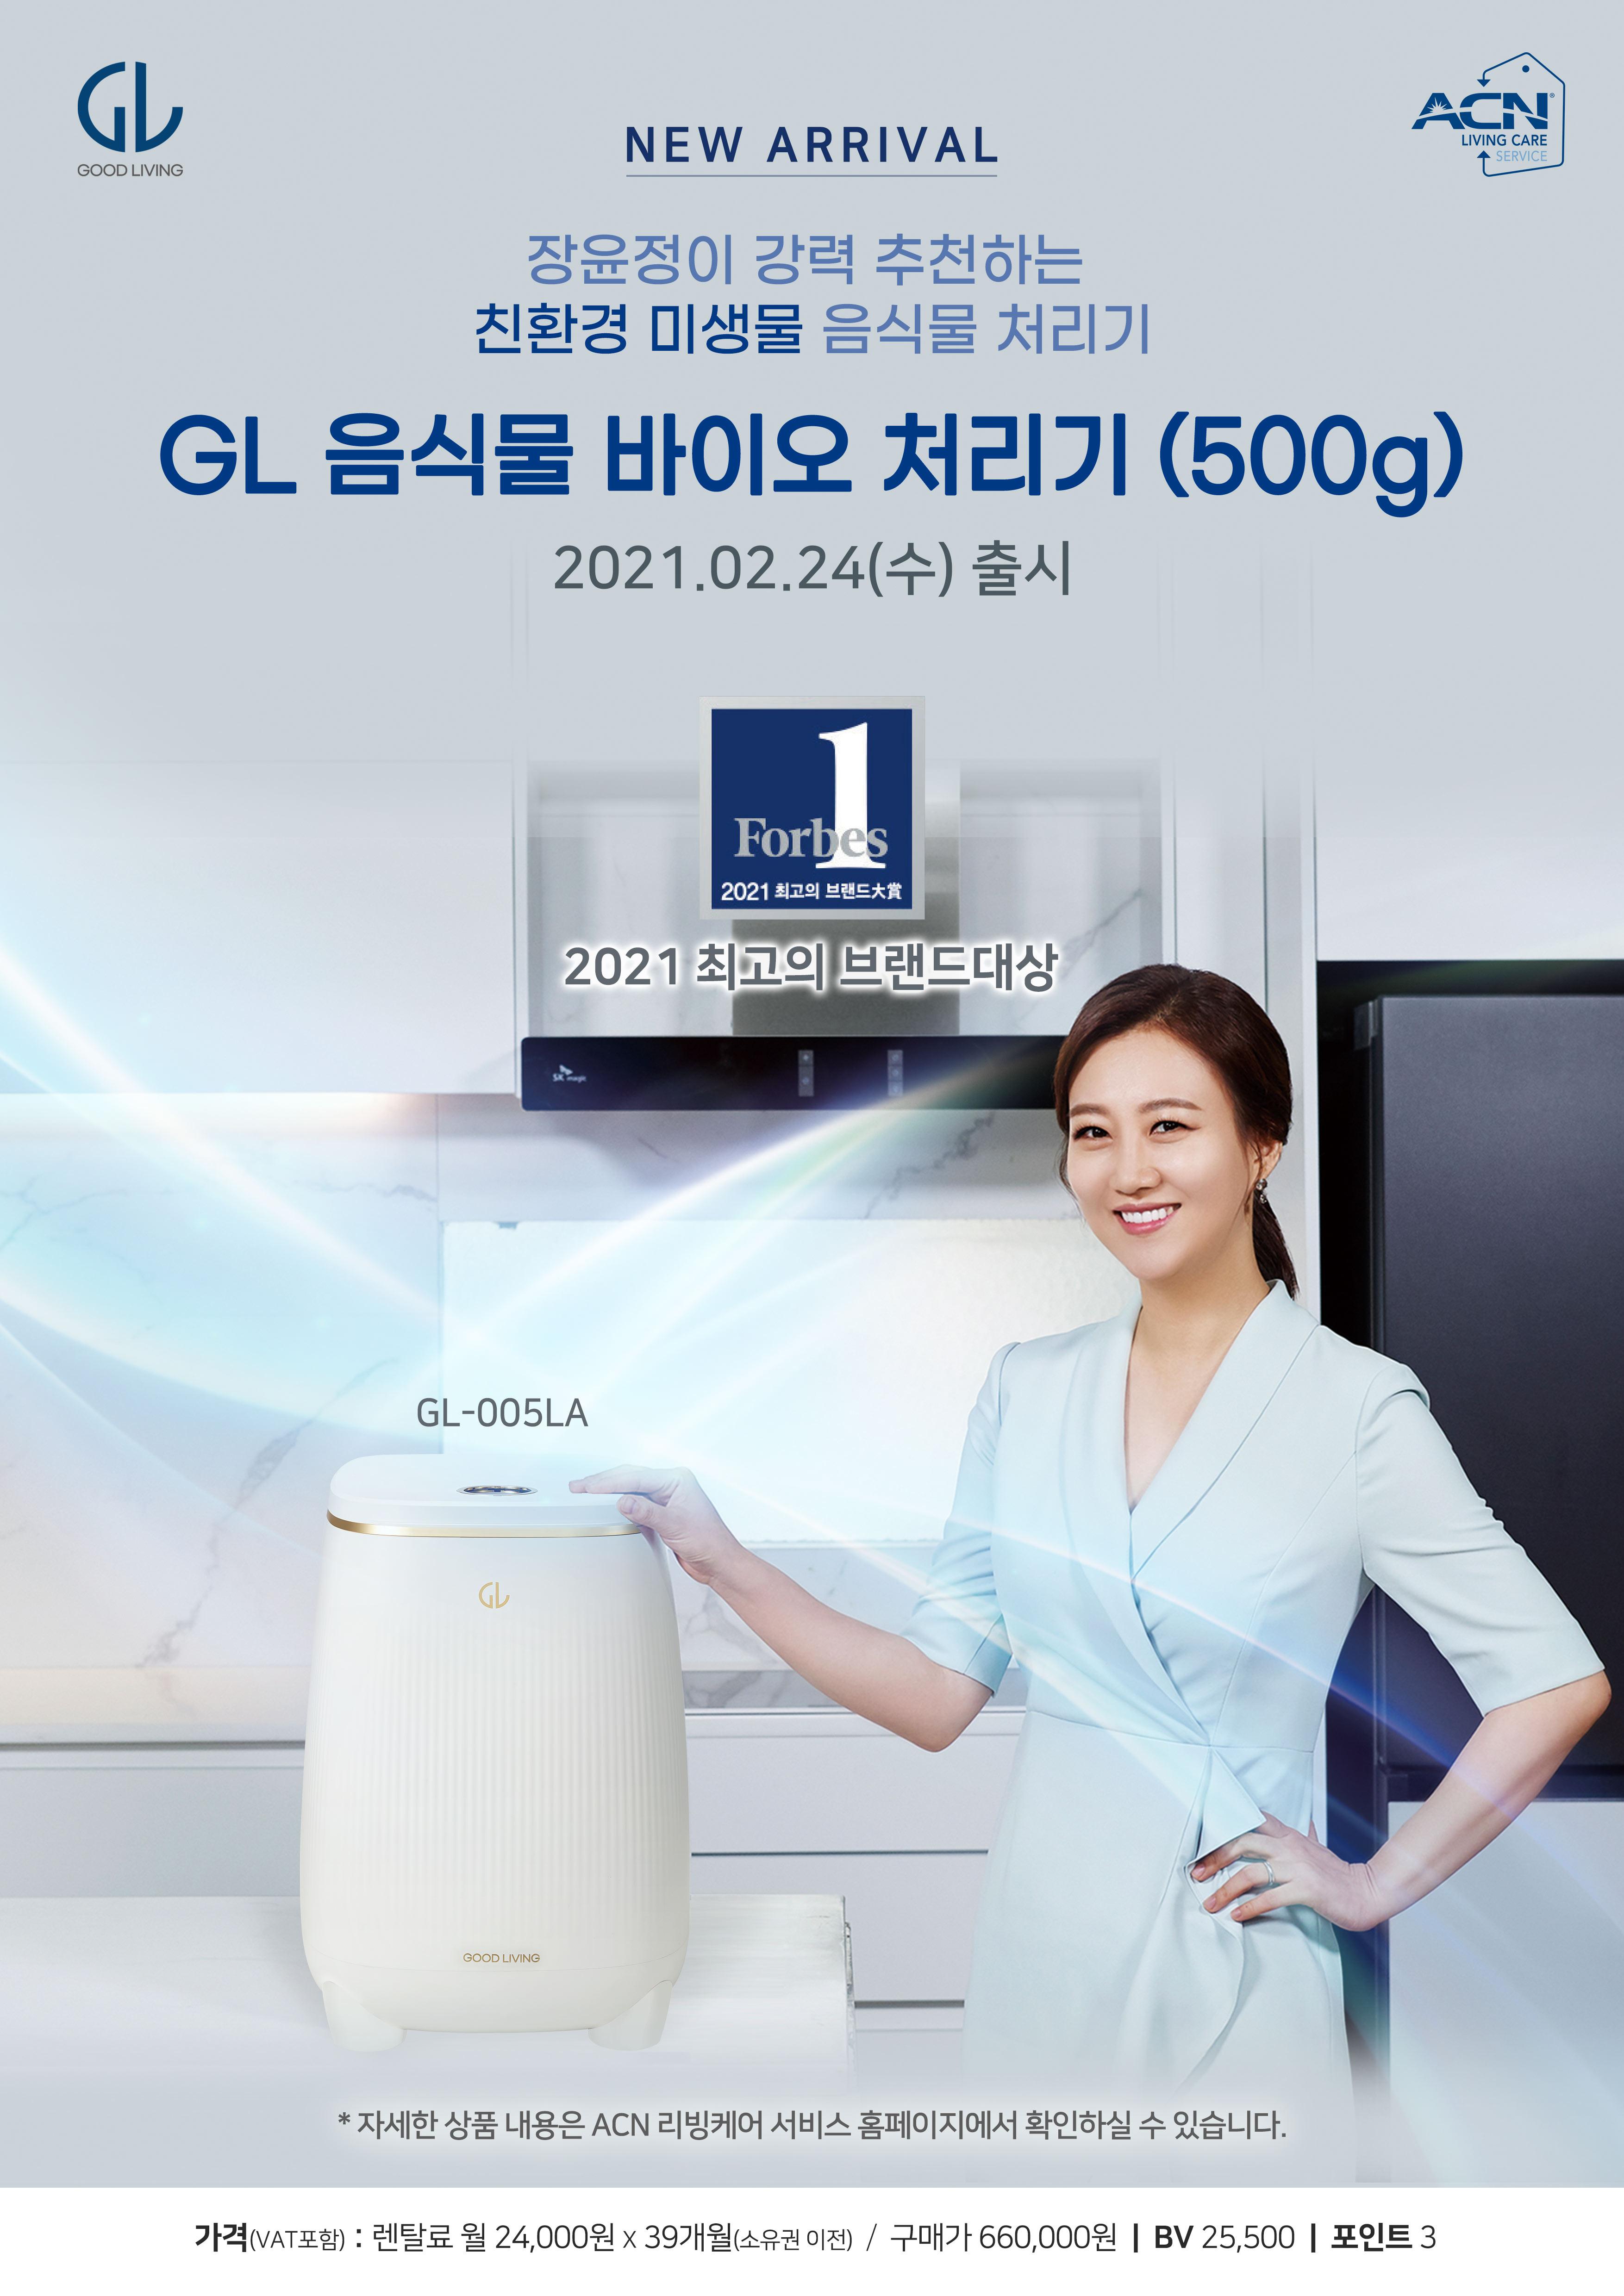 GL 음식물 바이오 처리기 (500g) 출시